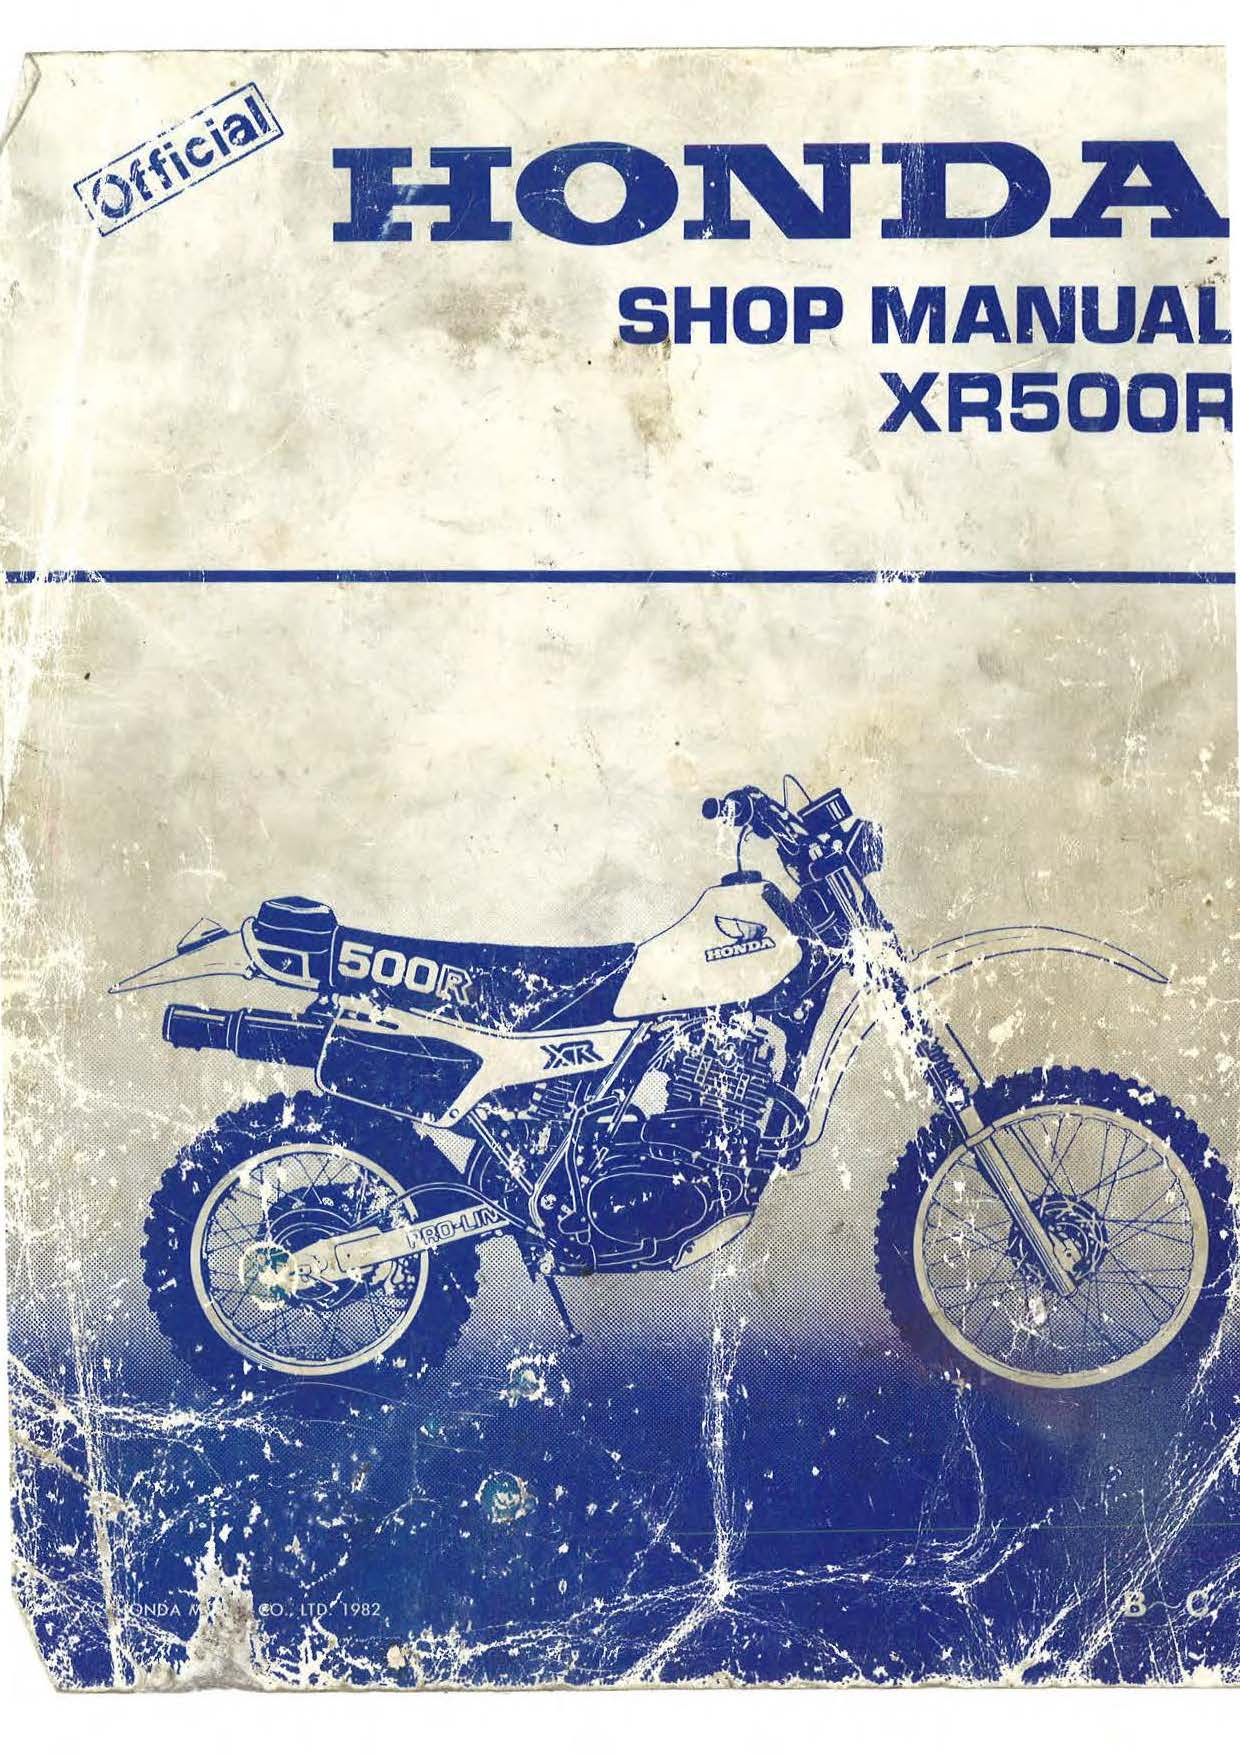 Workshop manual for Honda XR500R (1982)